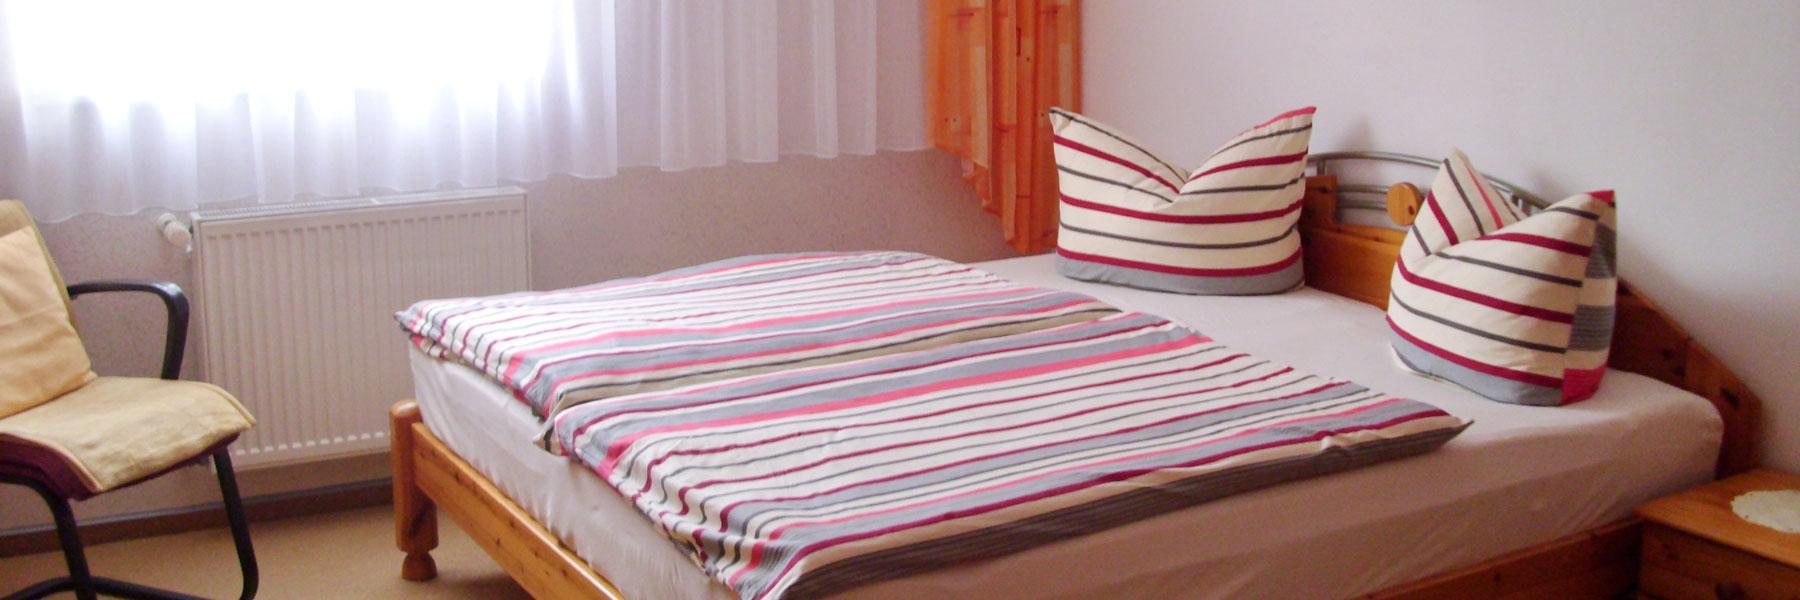 Doppelbett - Fewo Hildebrandt